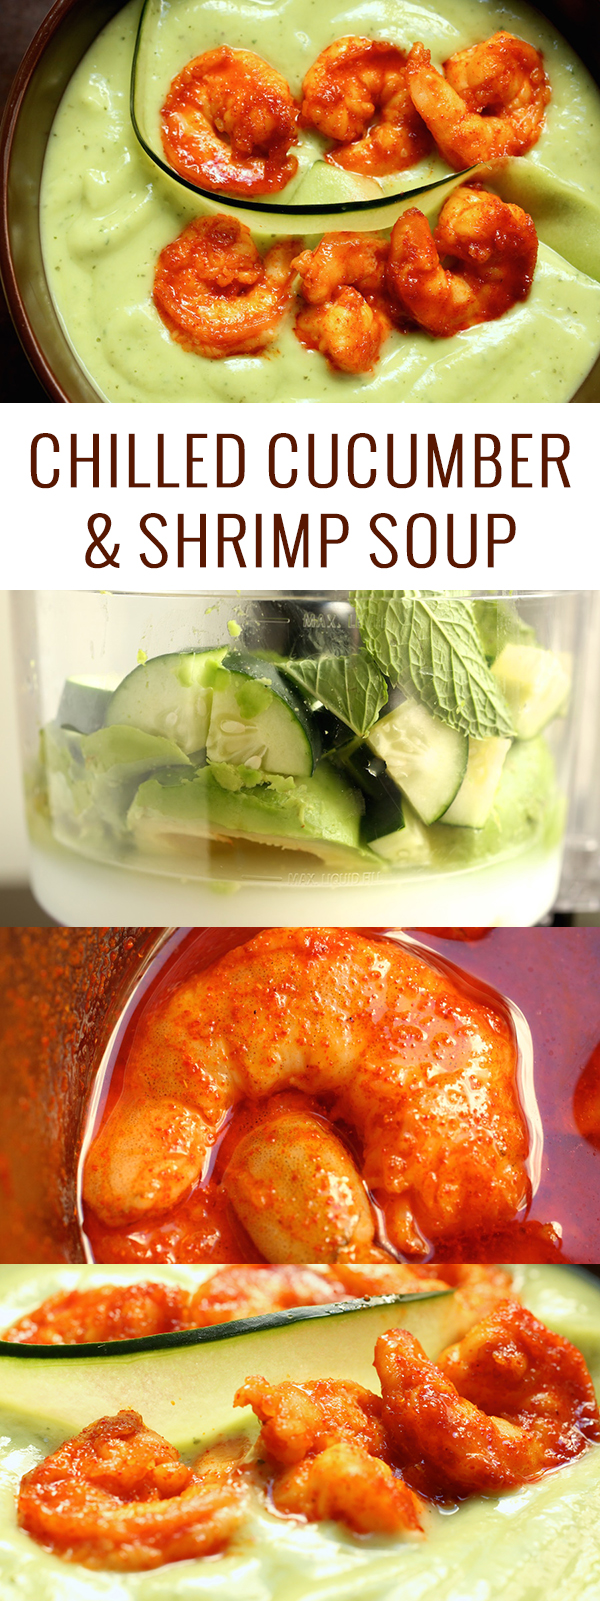 Chilled Cucumber & Shrimp Soup